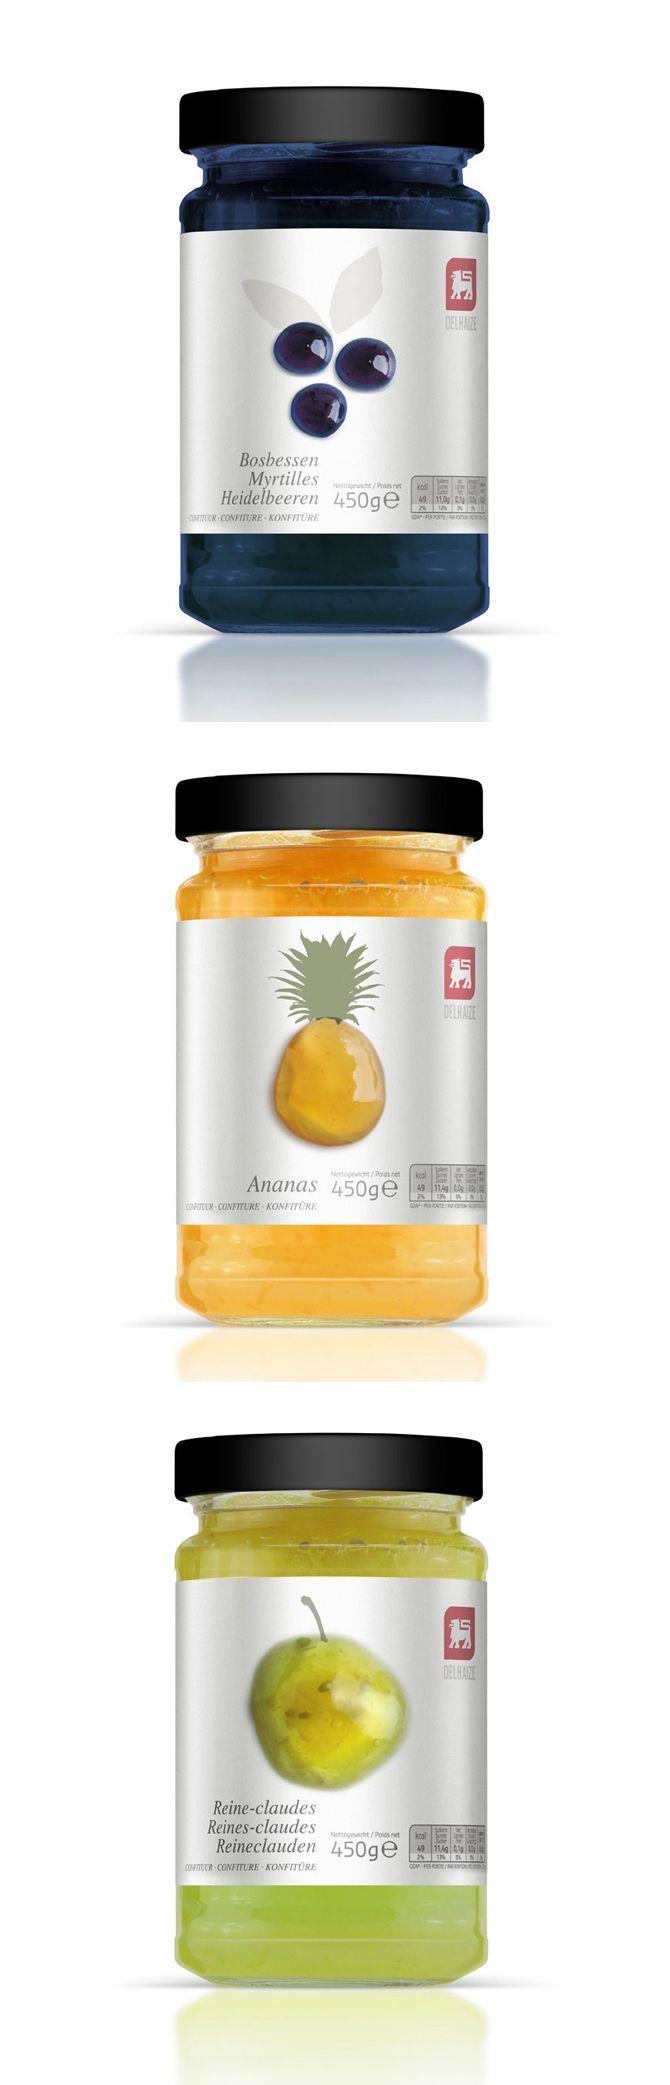 Jam Packaging Designs For Inspiration | We Design Packaging